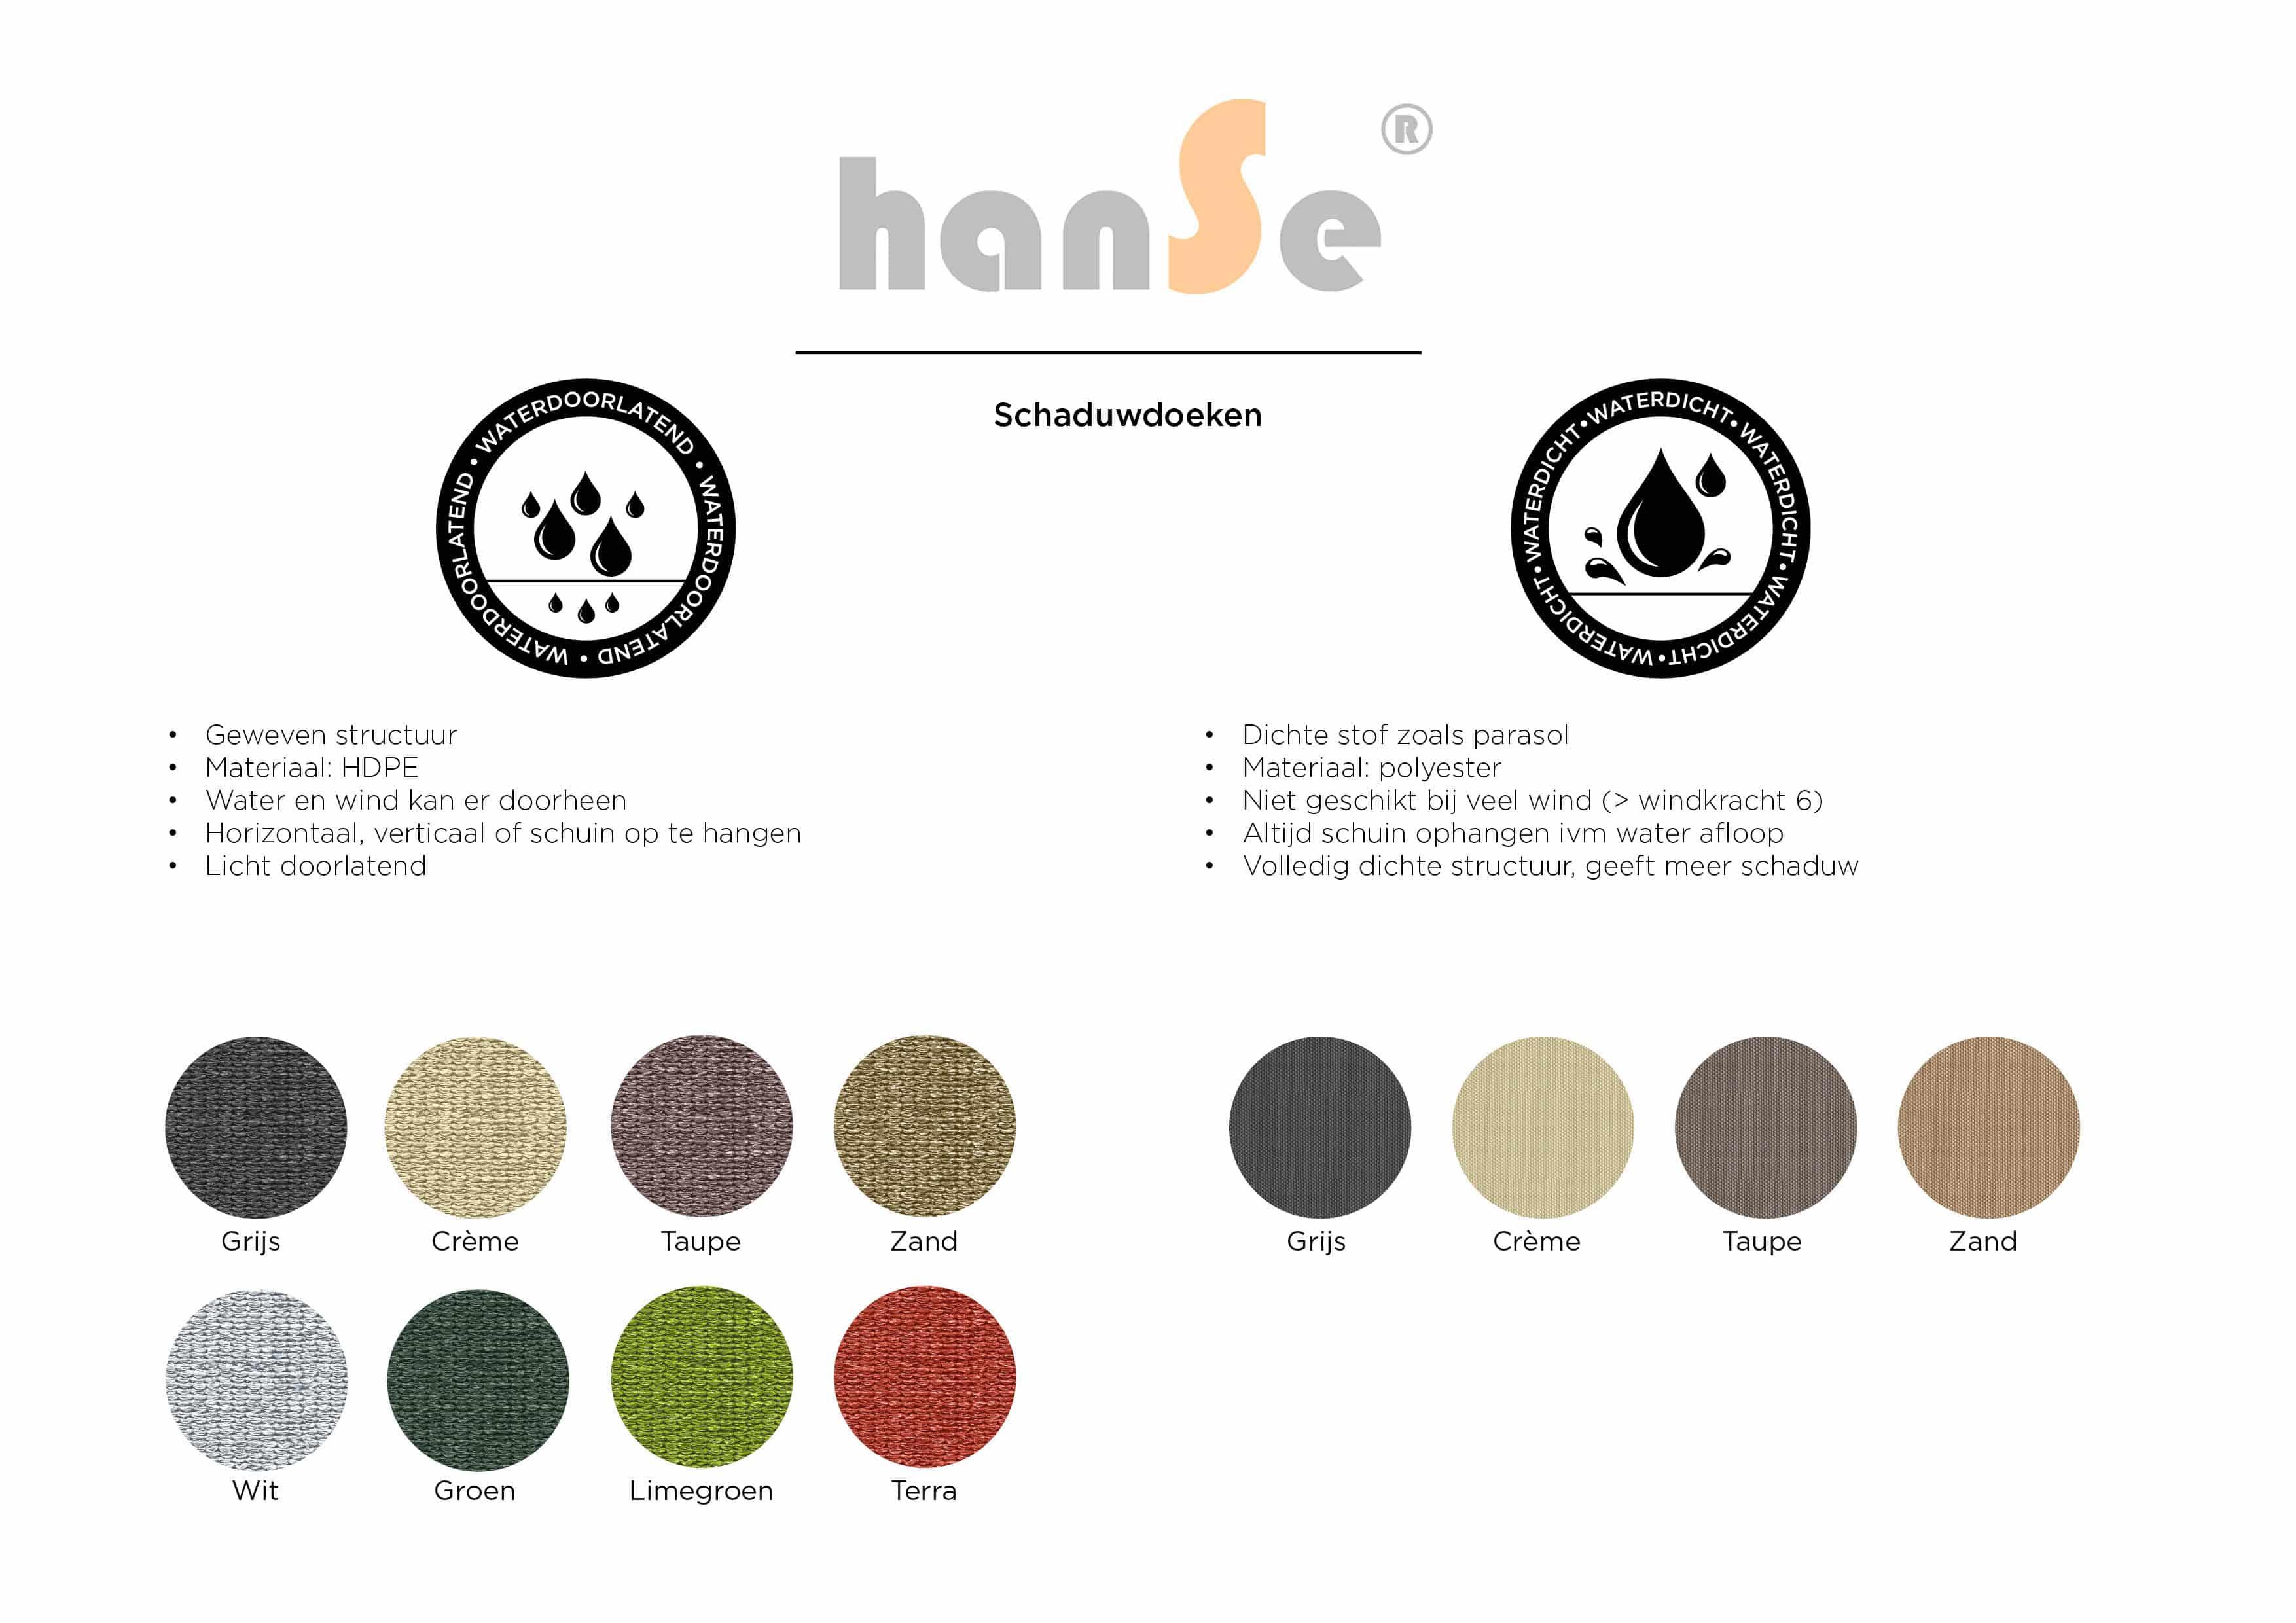 hanSe® Schaduwdoek Driehoek 90° Waterdoorlatend 4x5x6,8 m - Taupe